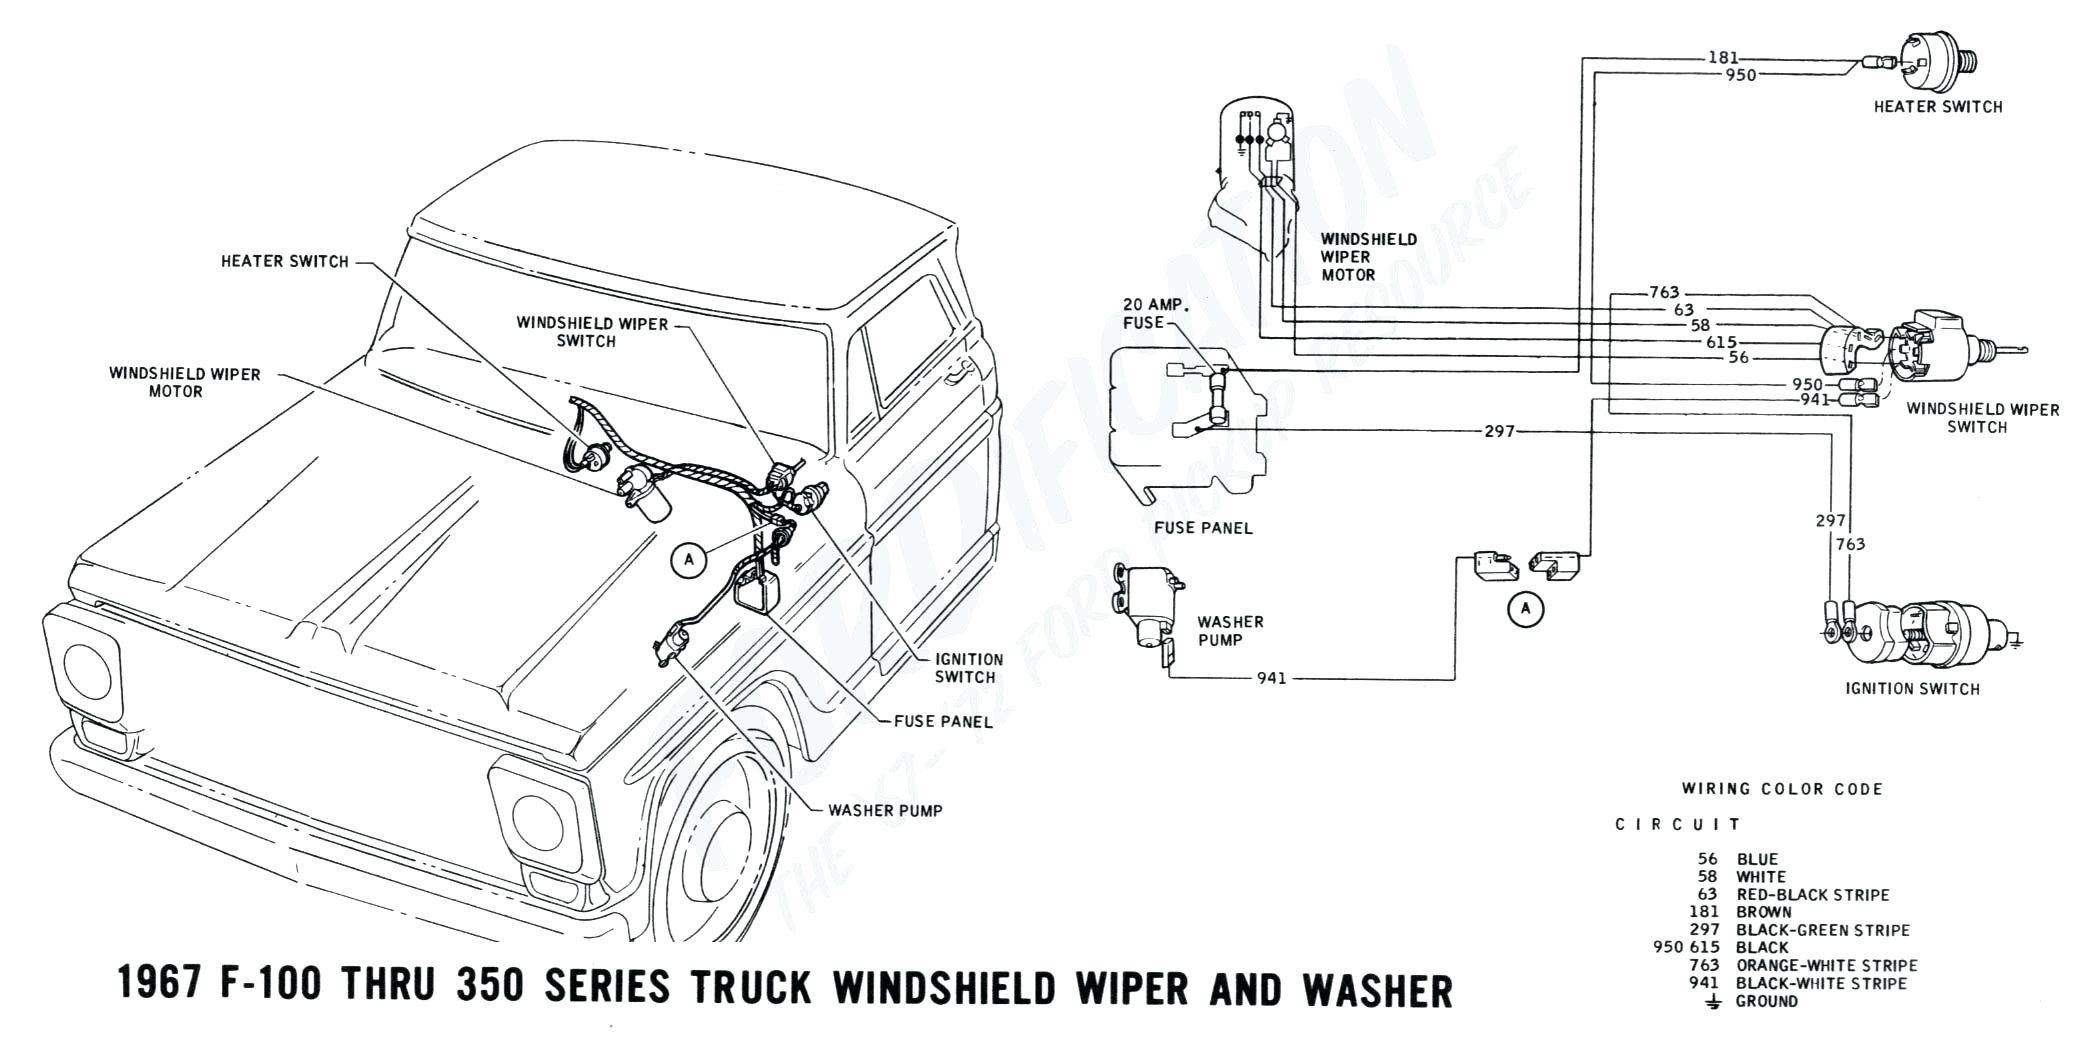 2 Speed Wiper Switch Wiring Diagram